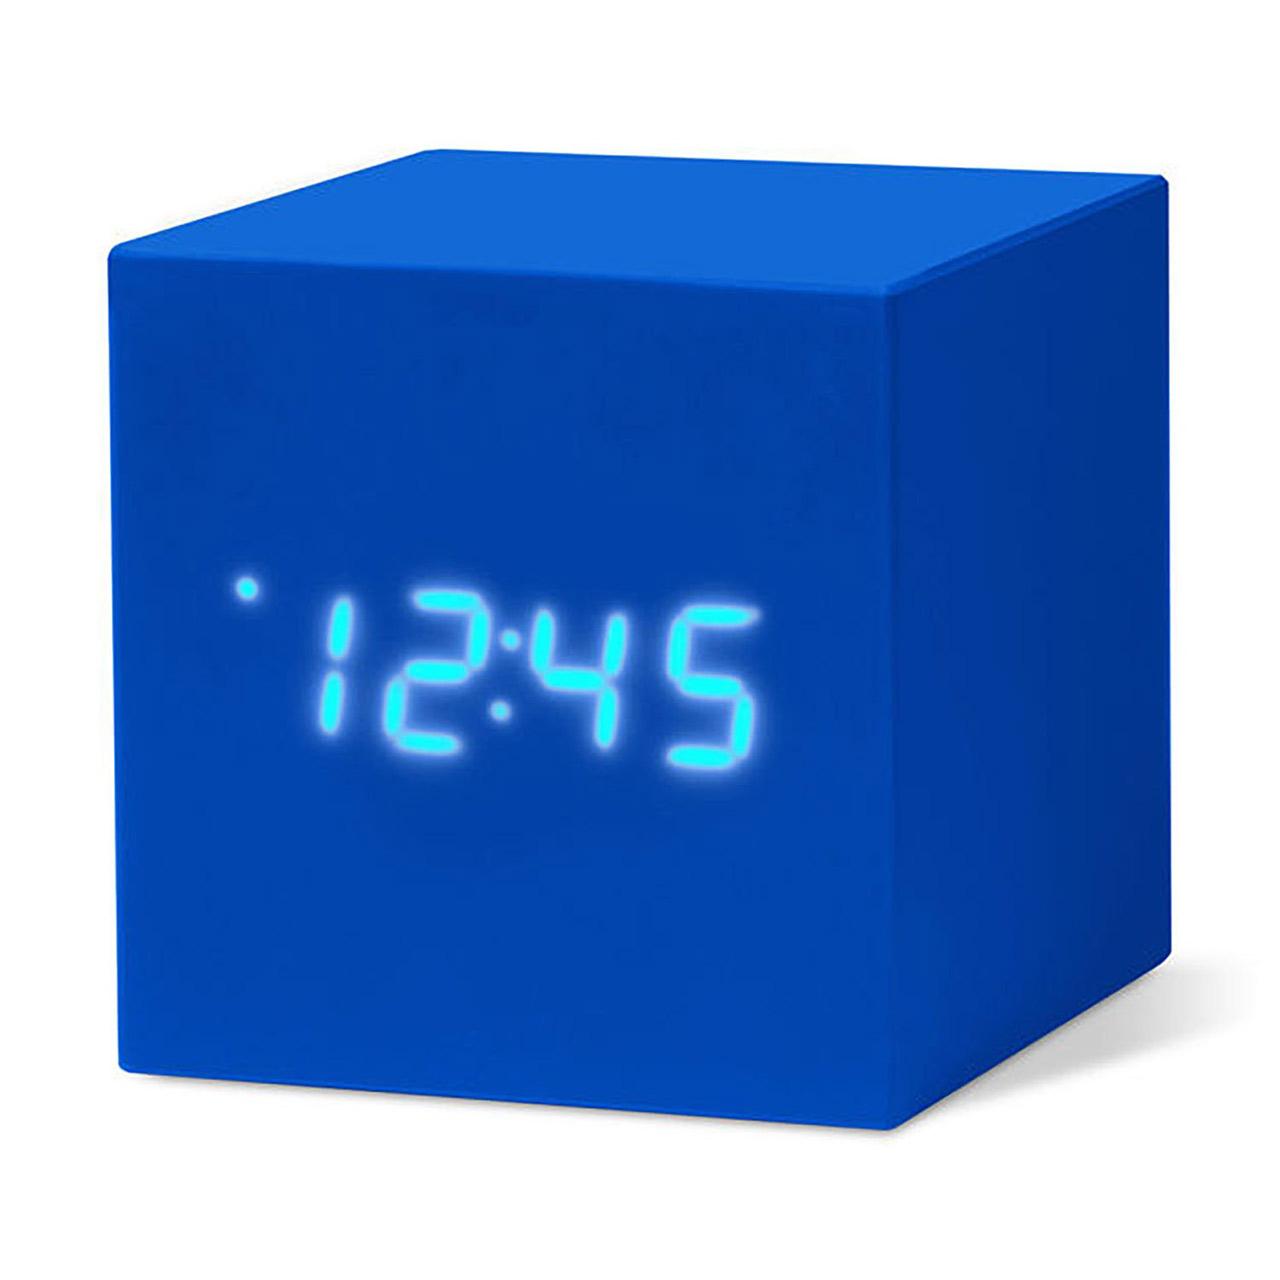 MoMA cube click clock blue / white LED | the design gift shop